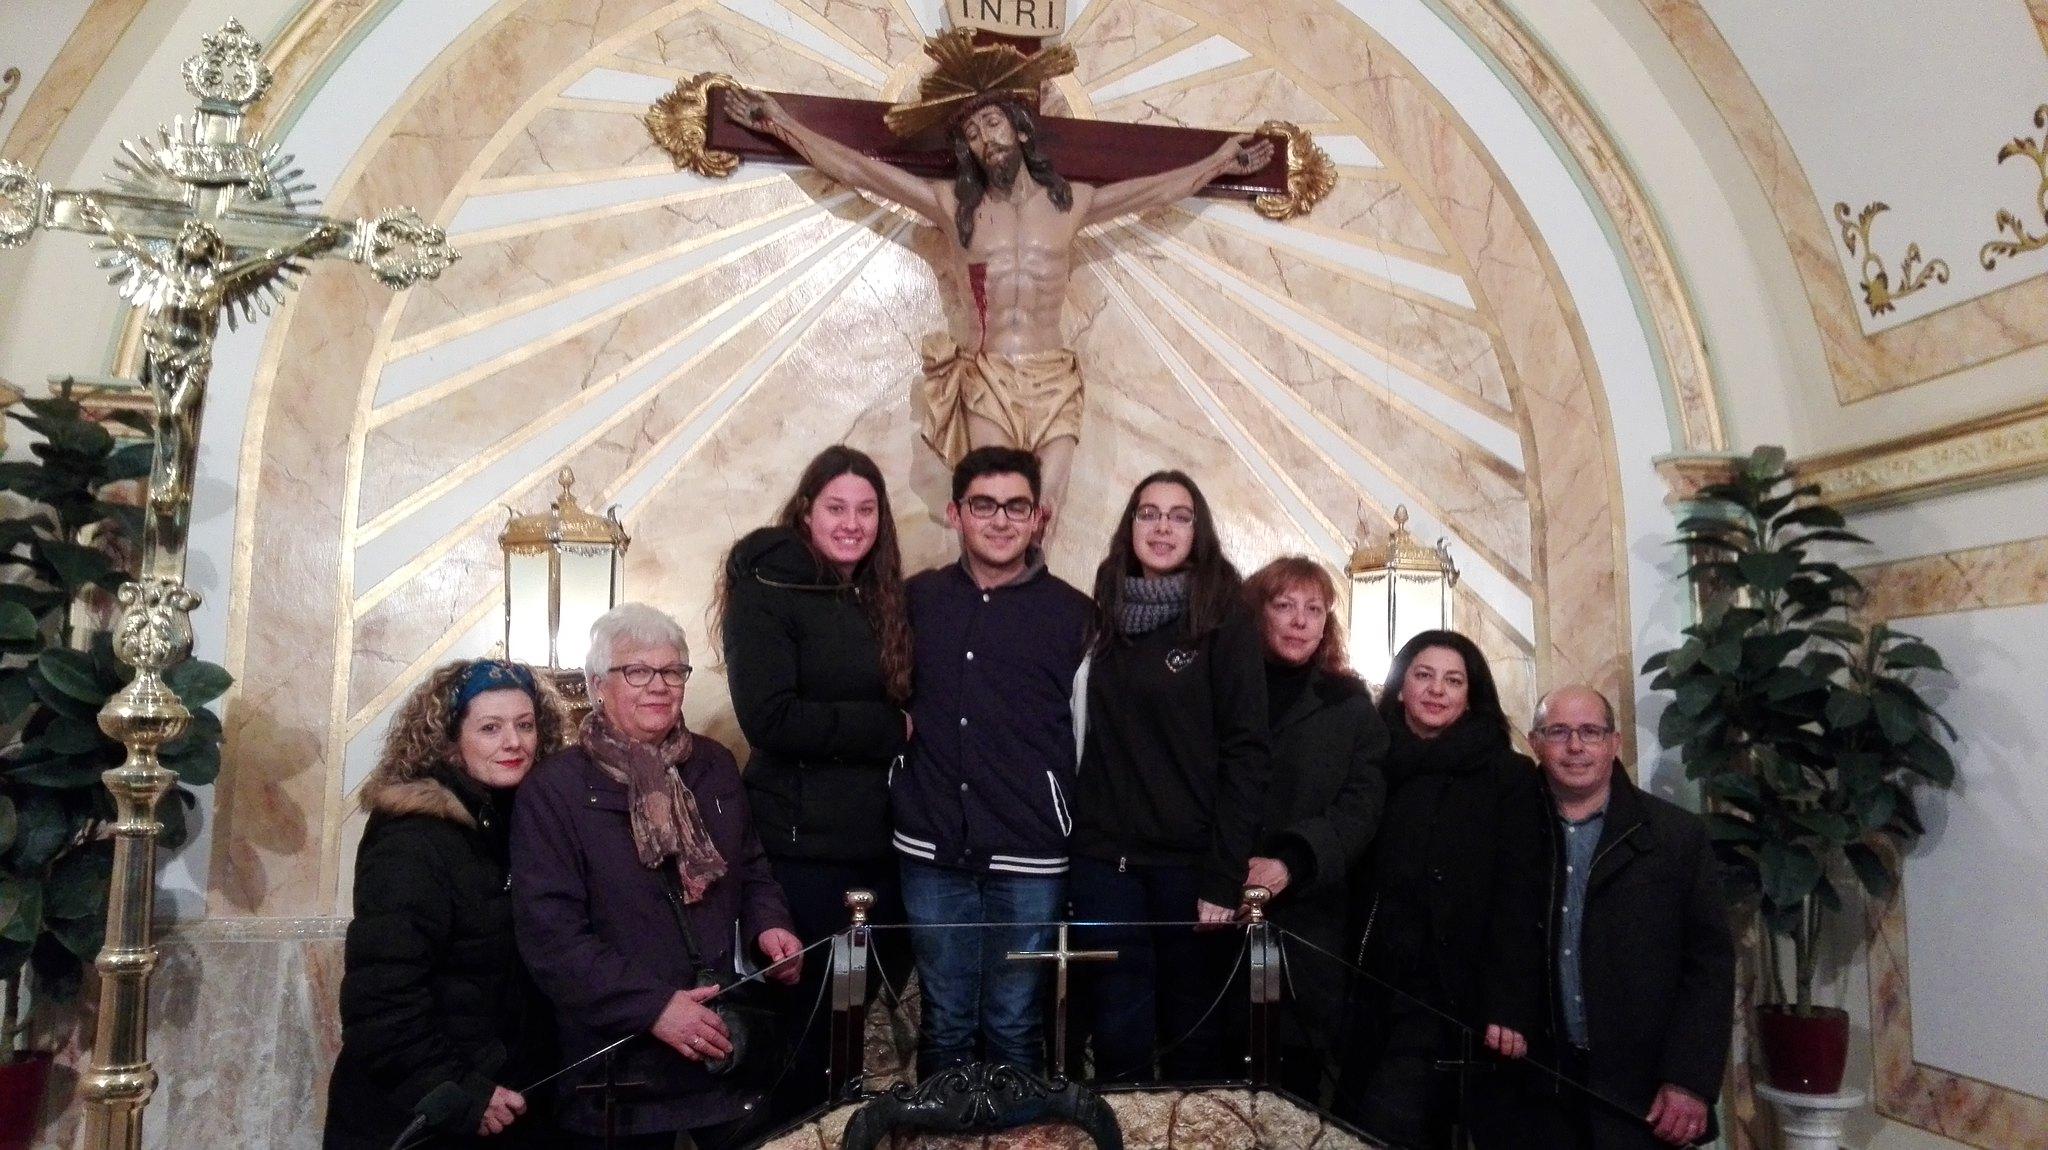 (2016-03-18) - VII Vía Crucis nocturno - Javier Romero Ripoll (128)